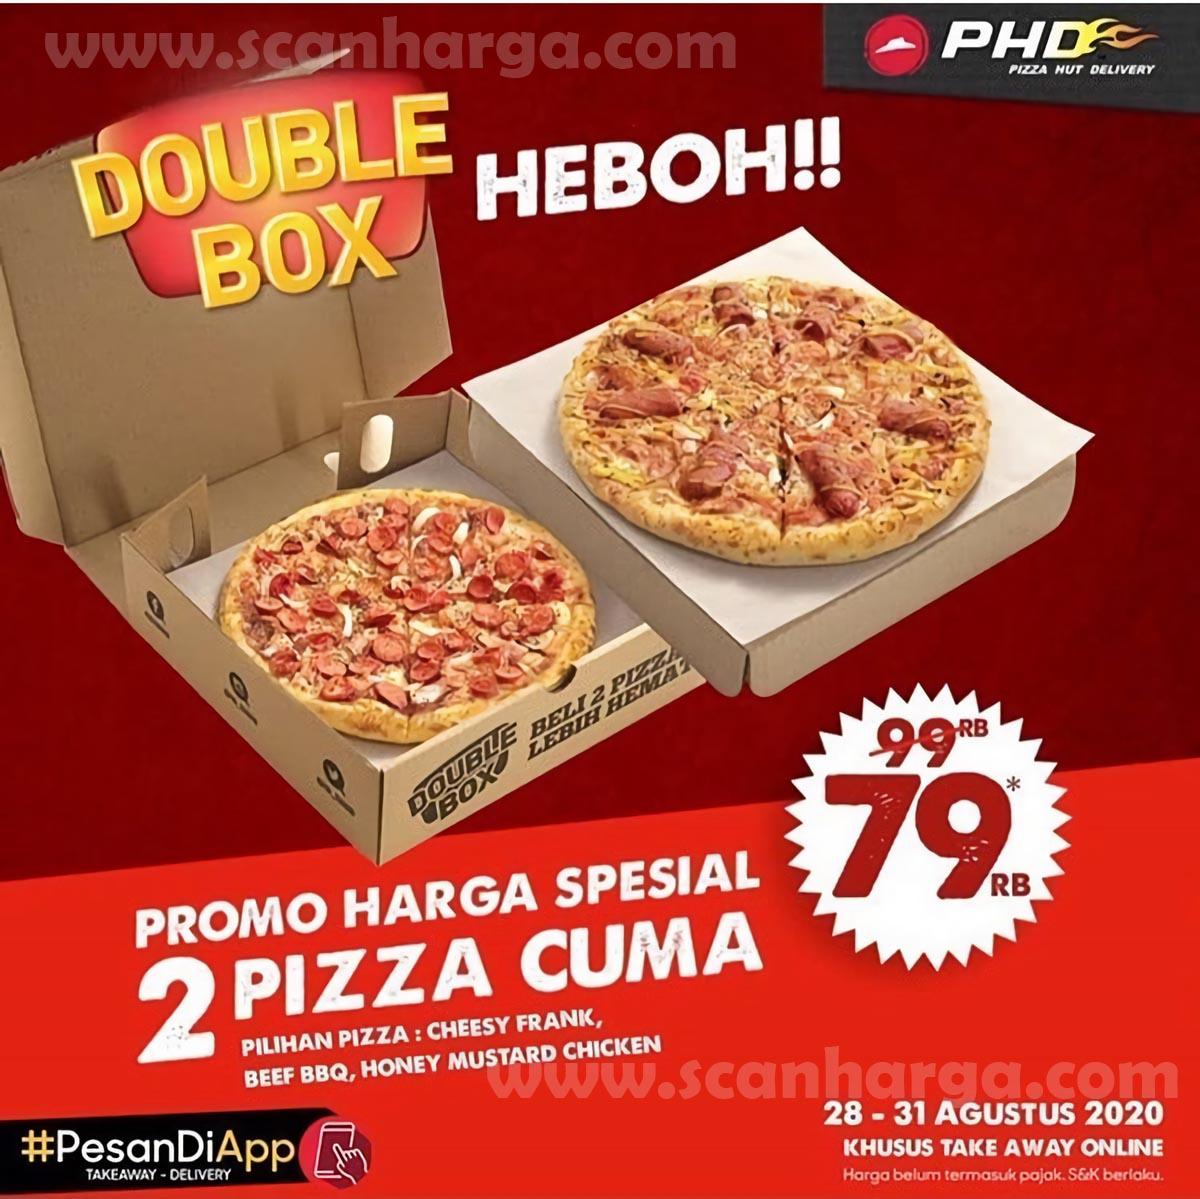 PHD Double Box Heboh - Promo Harga Spesial 2 Pizza Cuma 79Rb Periode 28 - 31 Agustus 2020